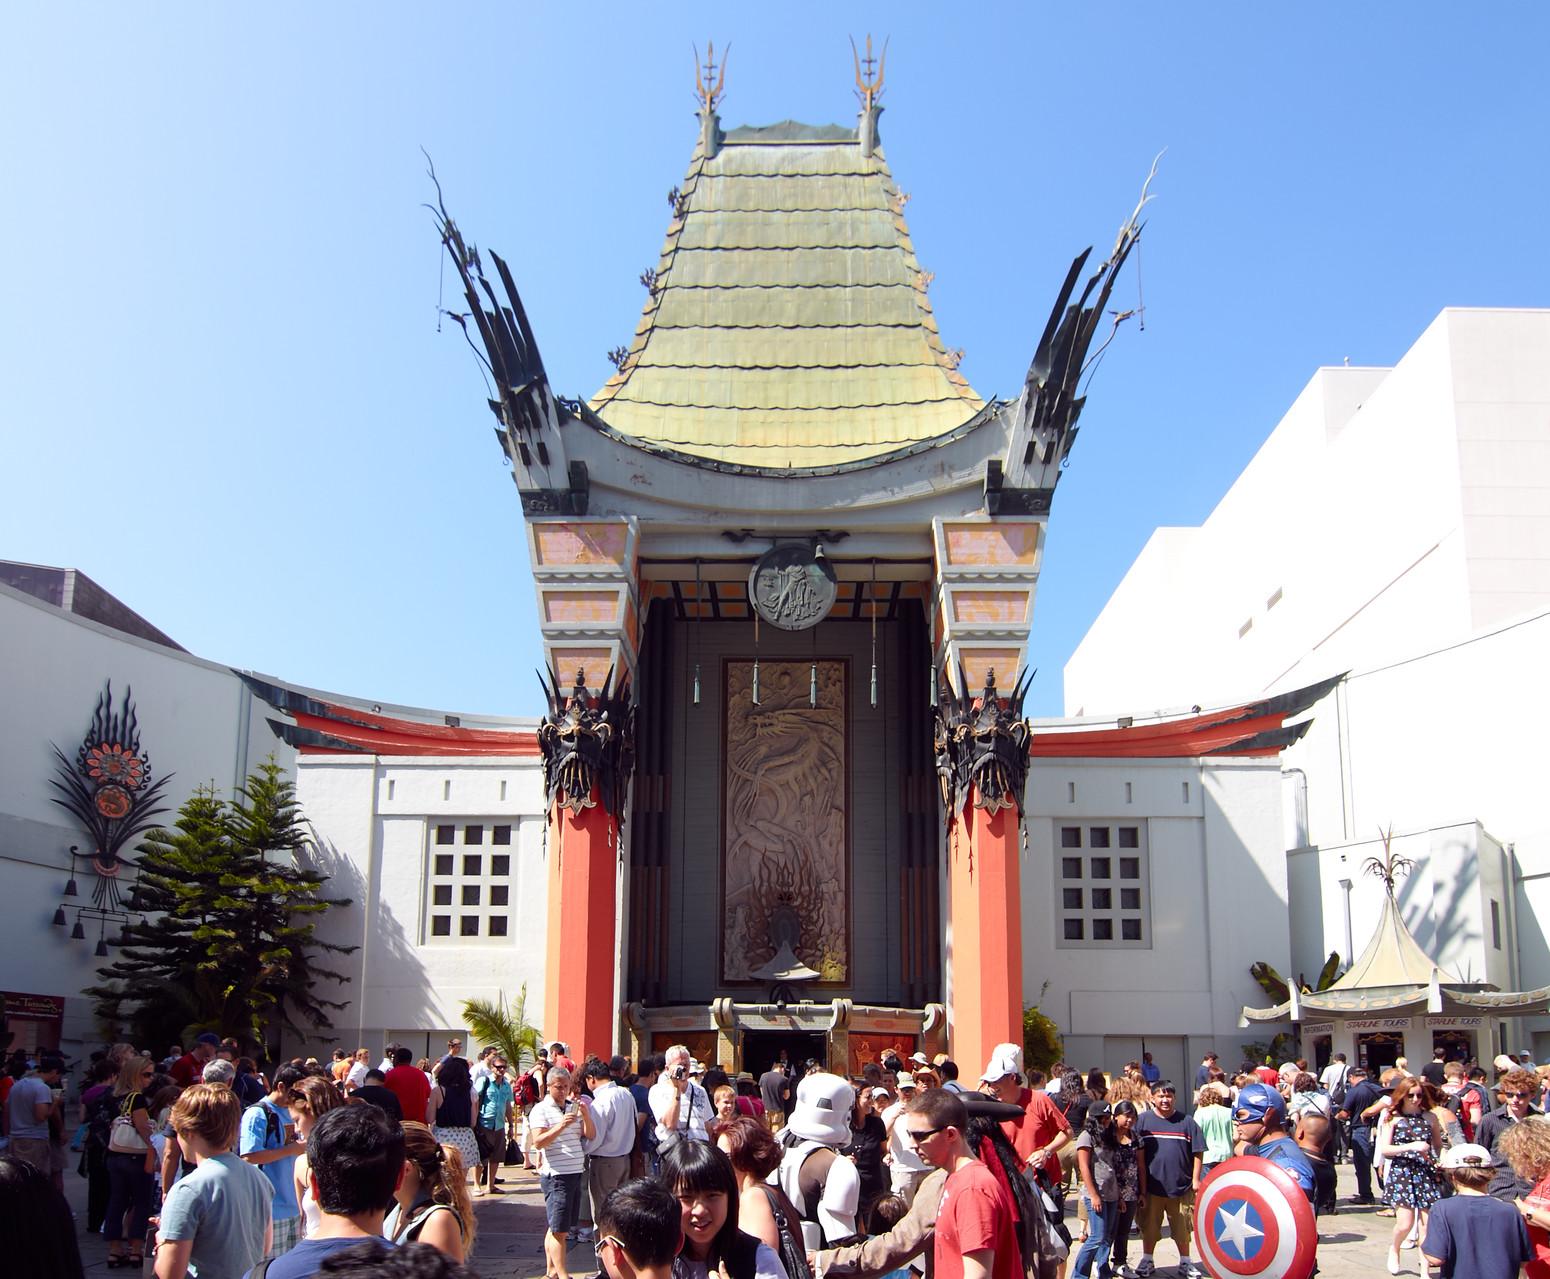 Das Chinese Theater ist das bekannteste Kino Hollywoods.